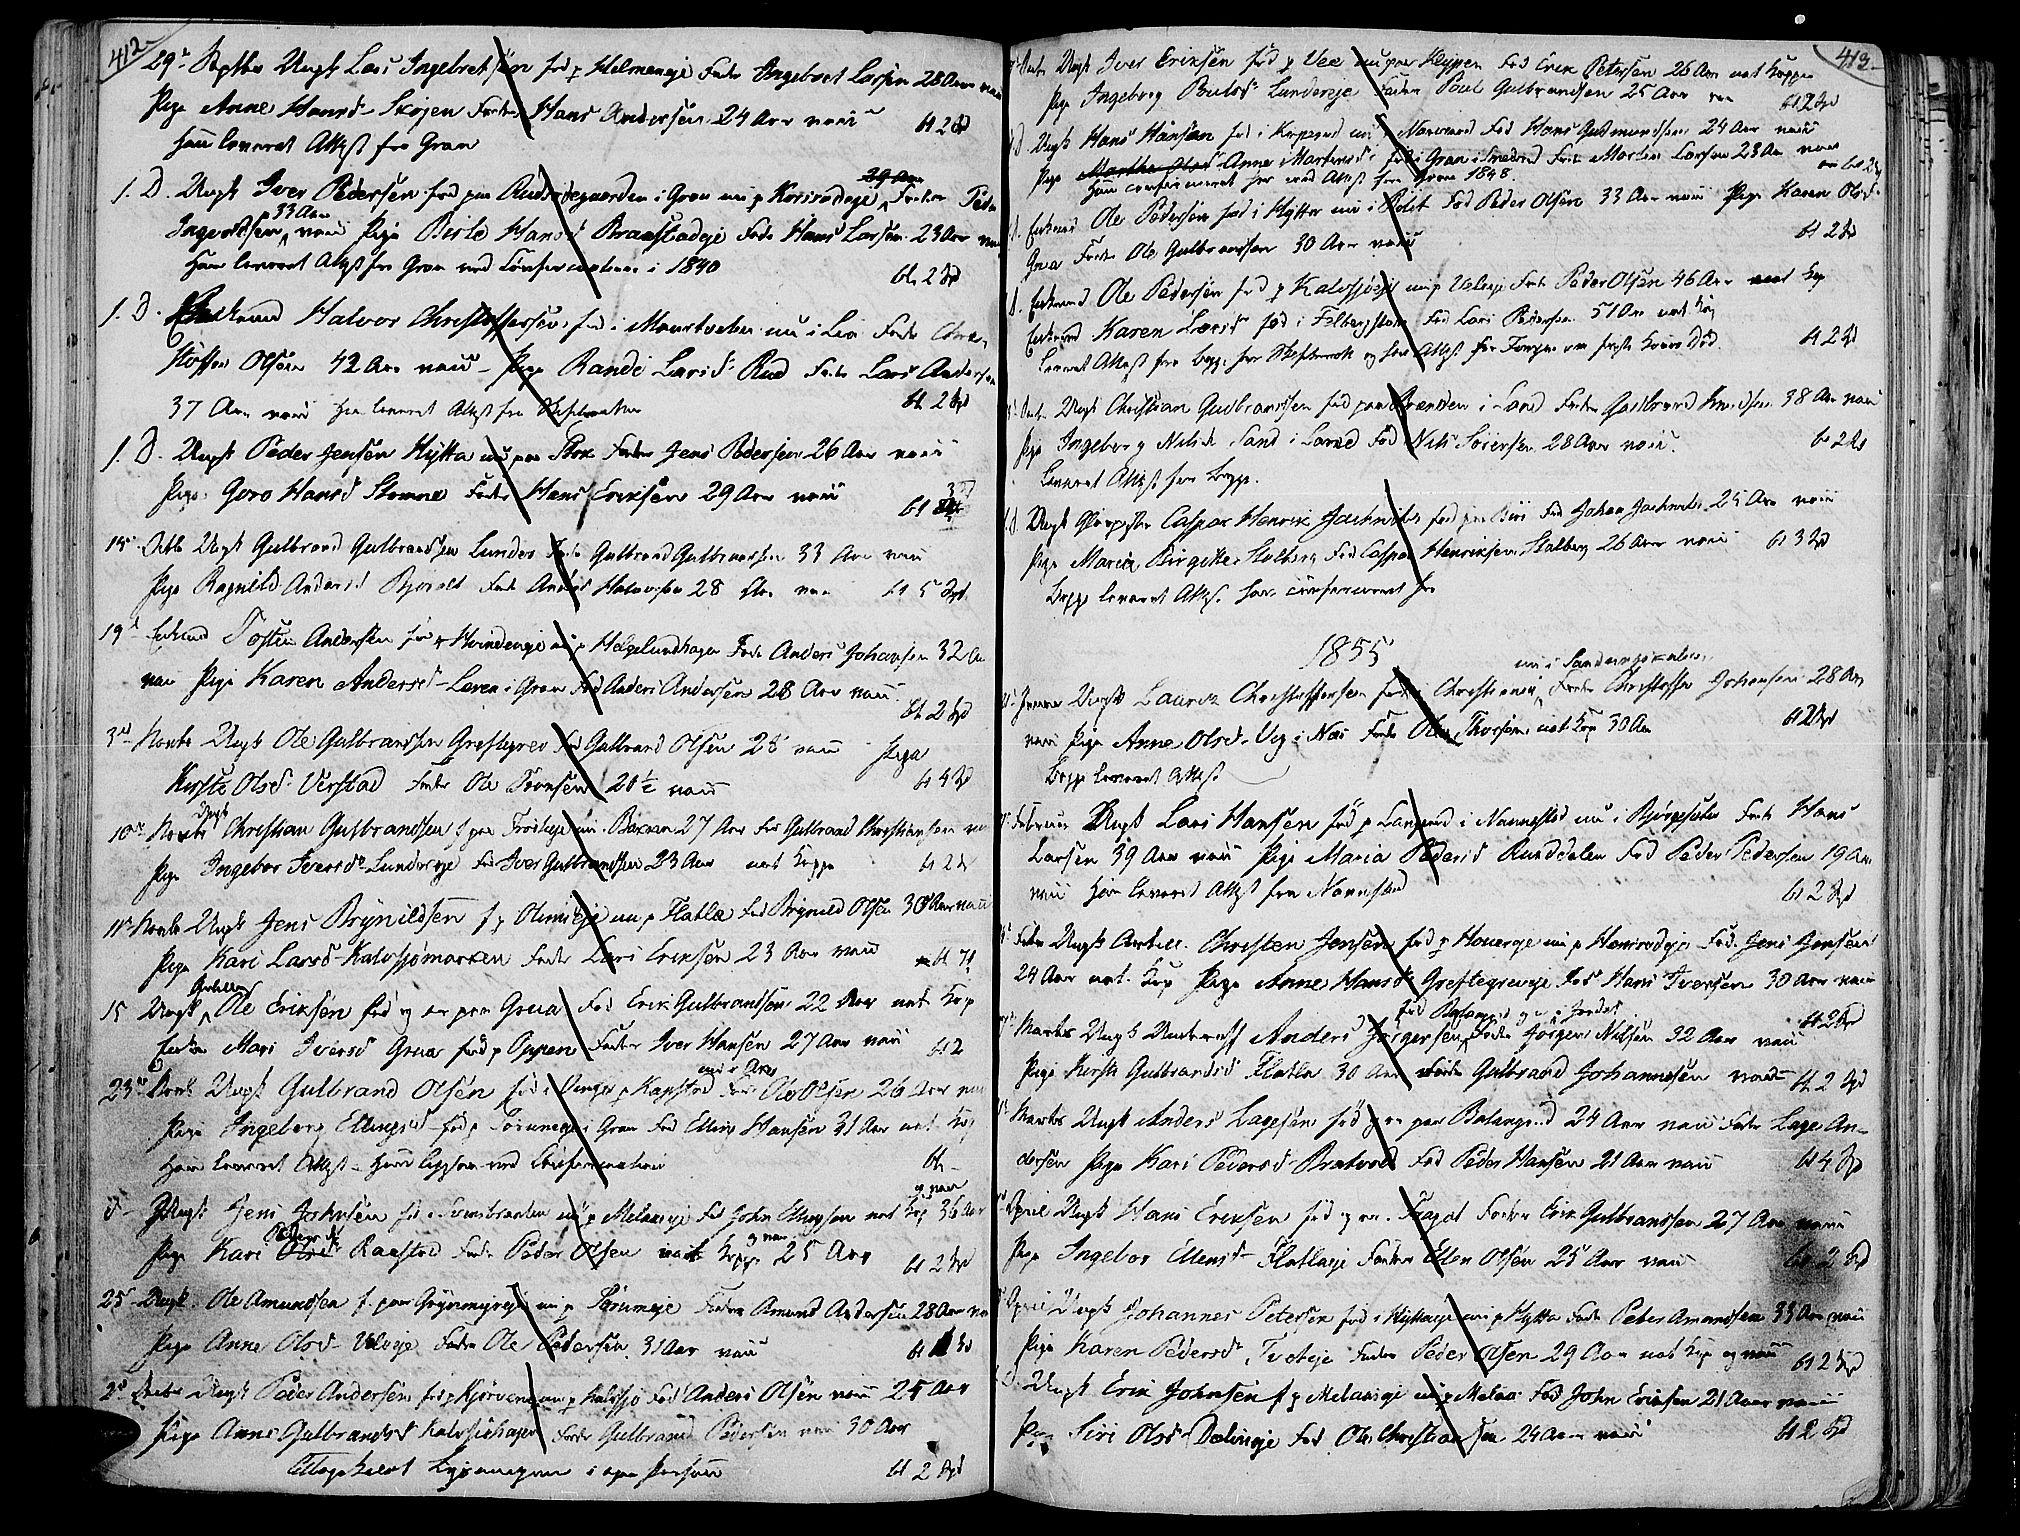 SAH, Jevnaker prestekontor, Ministerialbok nr. 4, 1800-1861, s. 412-413